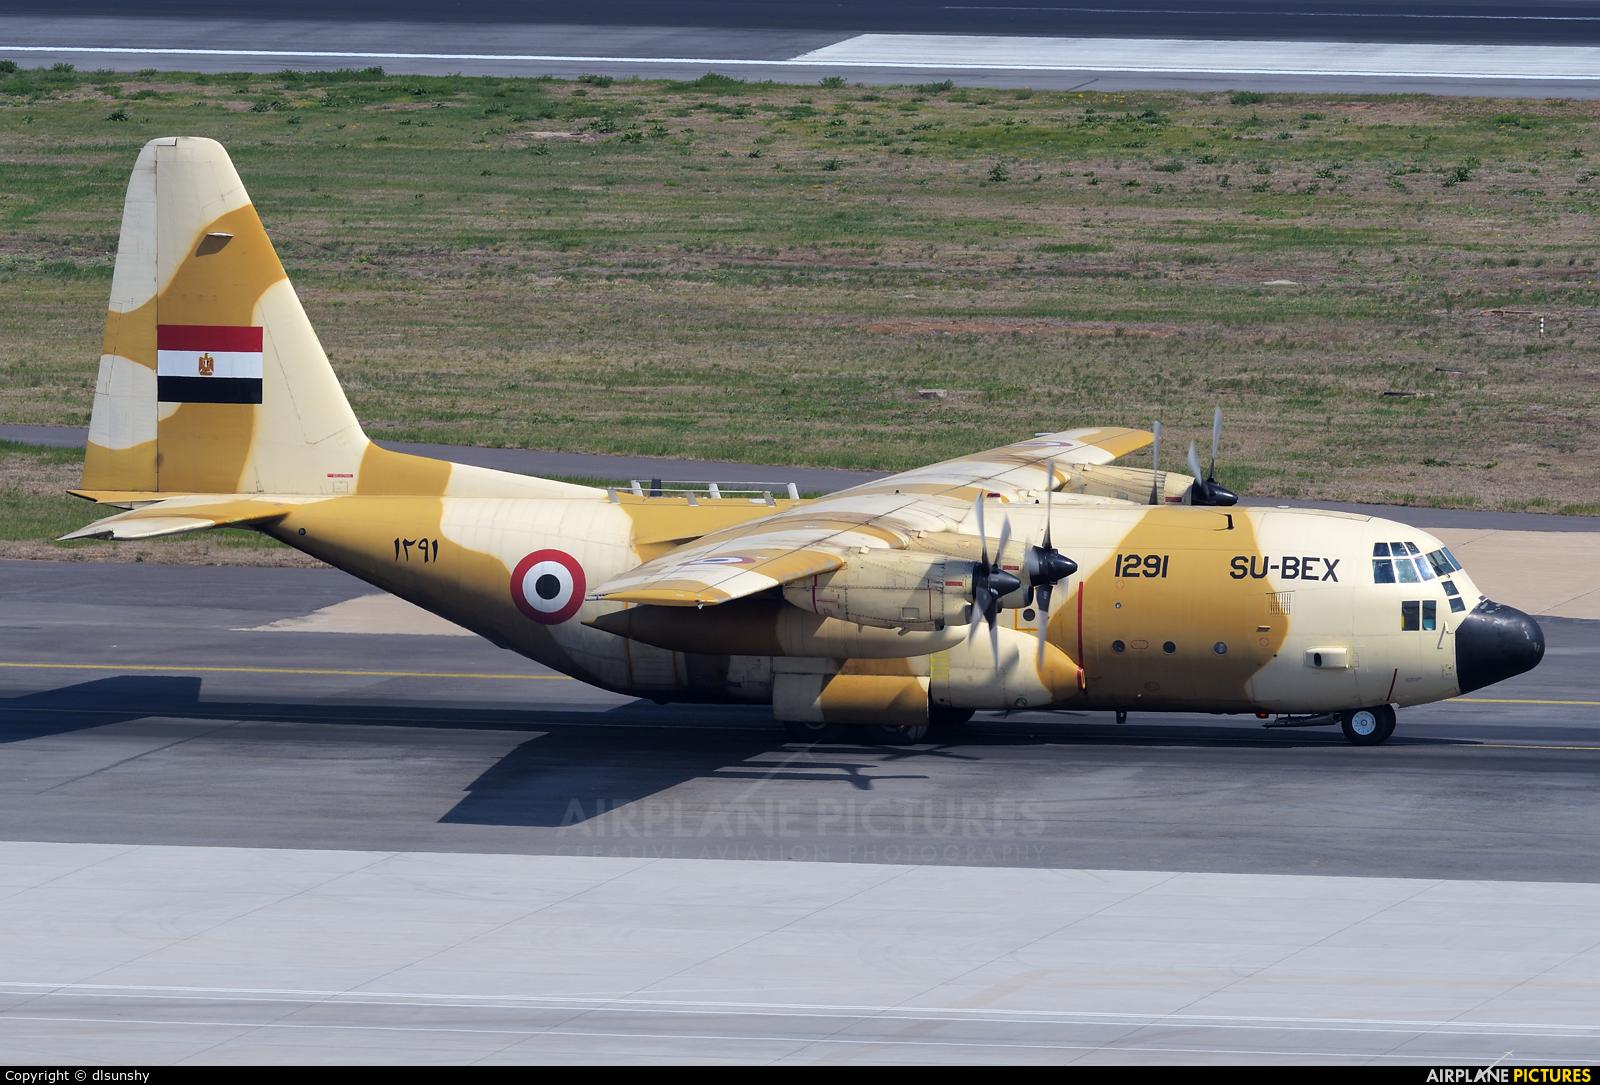 Egypt - Air Force SU-BEX aircraft at Dalian Zhoushuizi Int'l